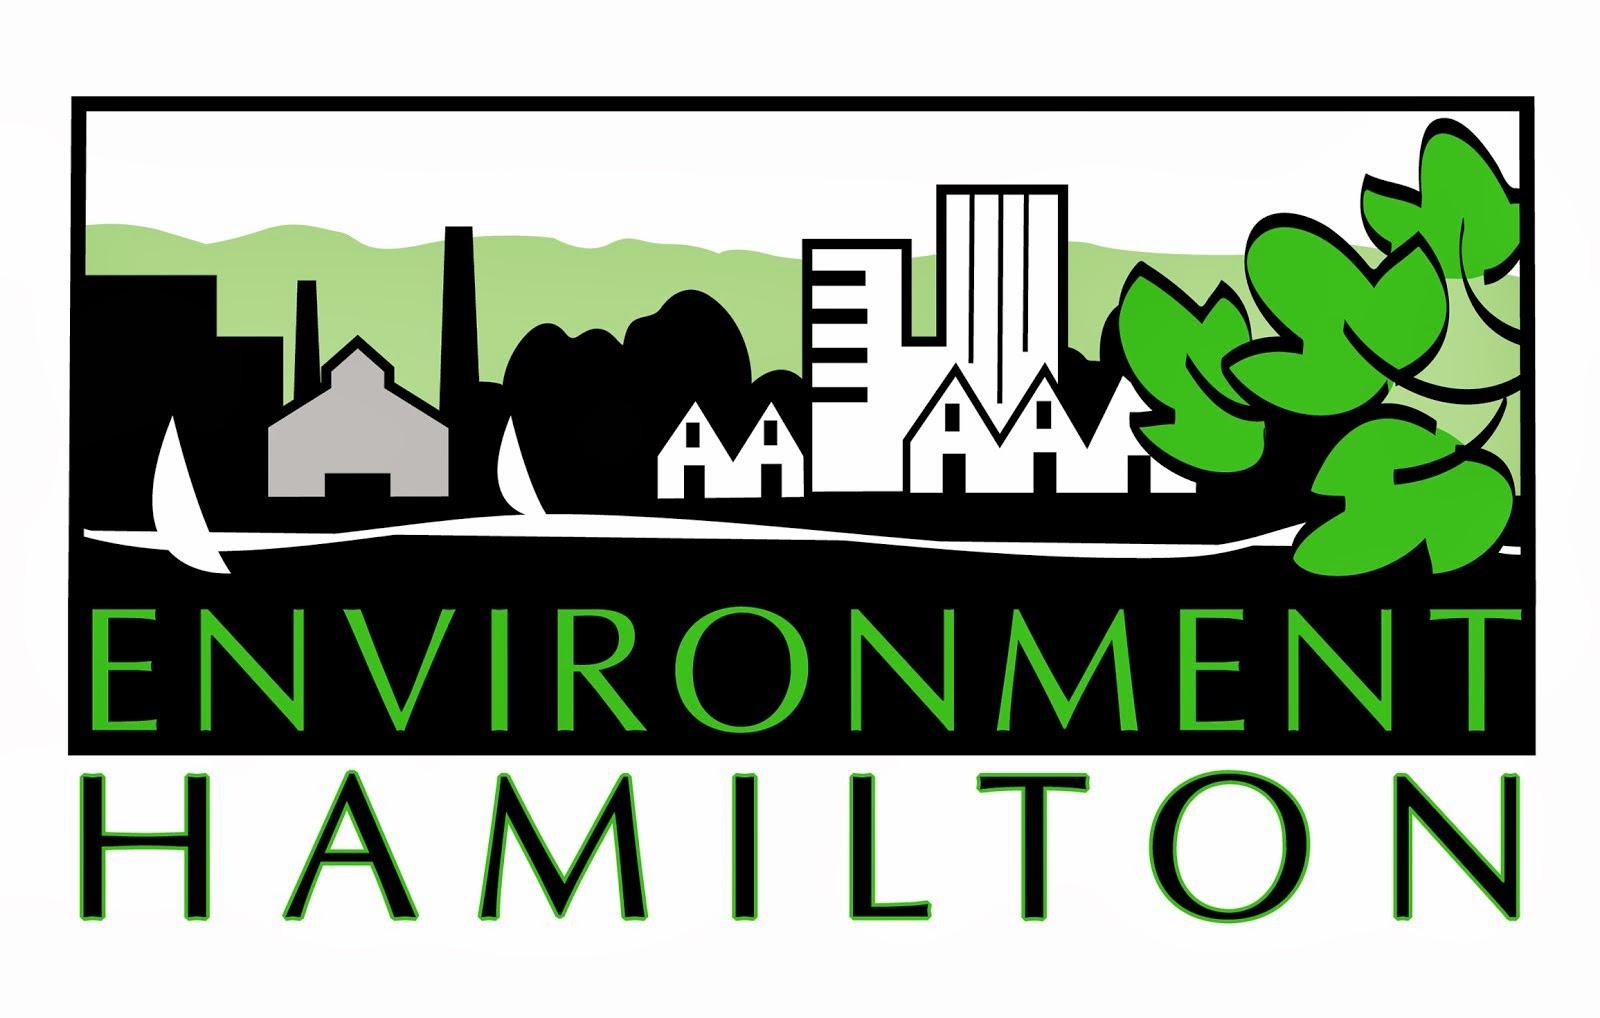 Environment Hamilton